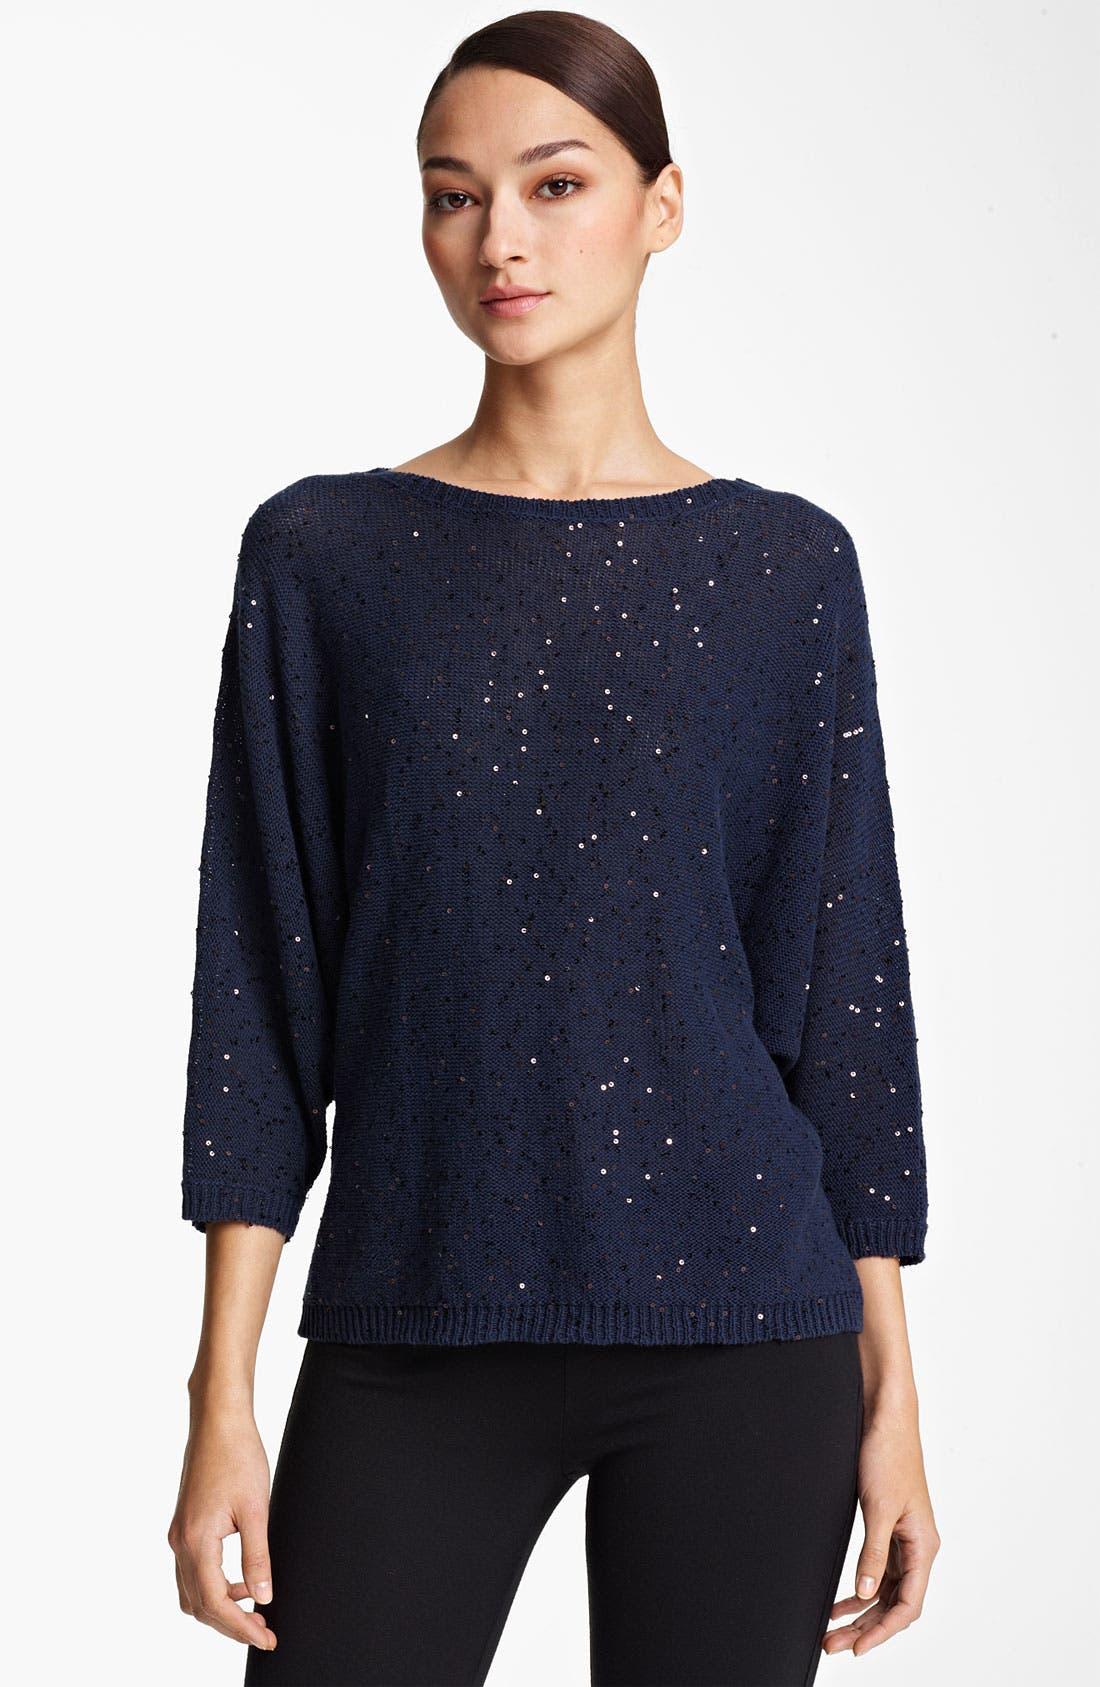 Alternate Image 1 Selected - Fabiana Filippi Paillette Crochet Knit Top